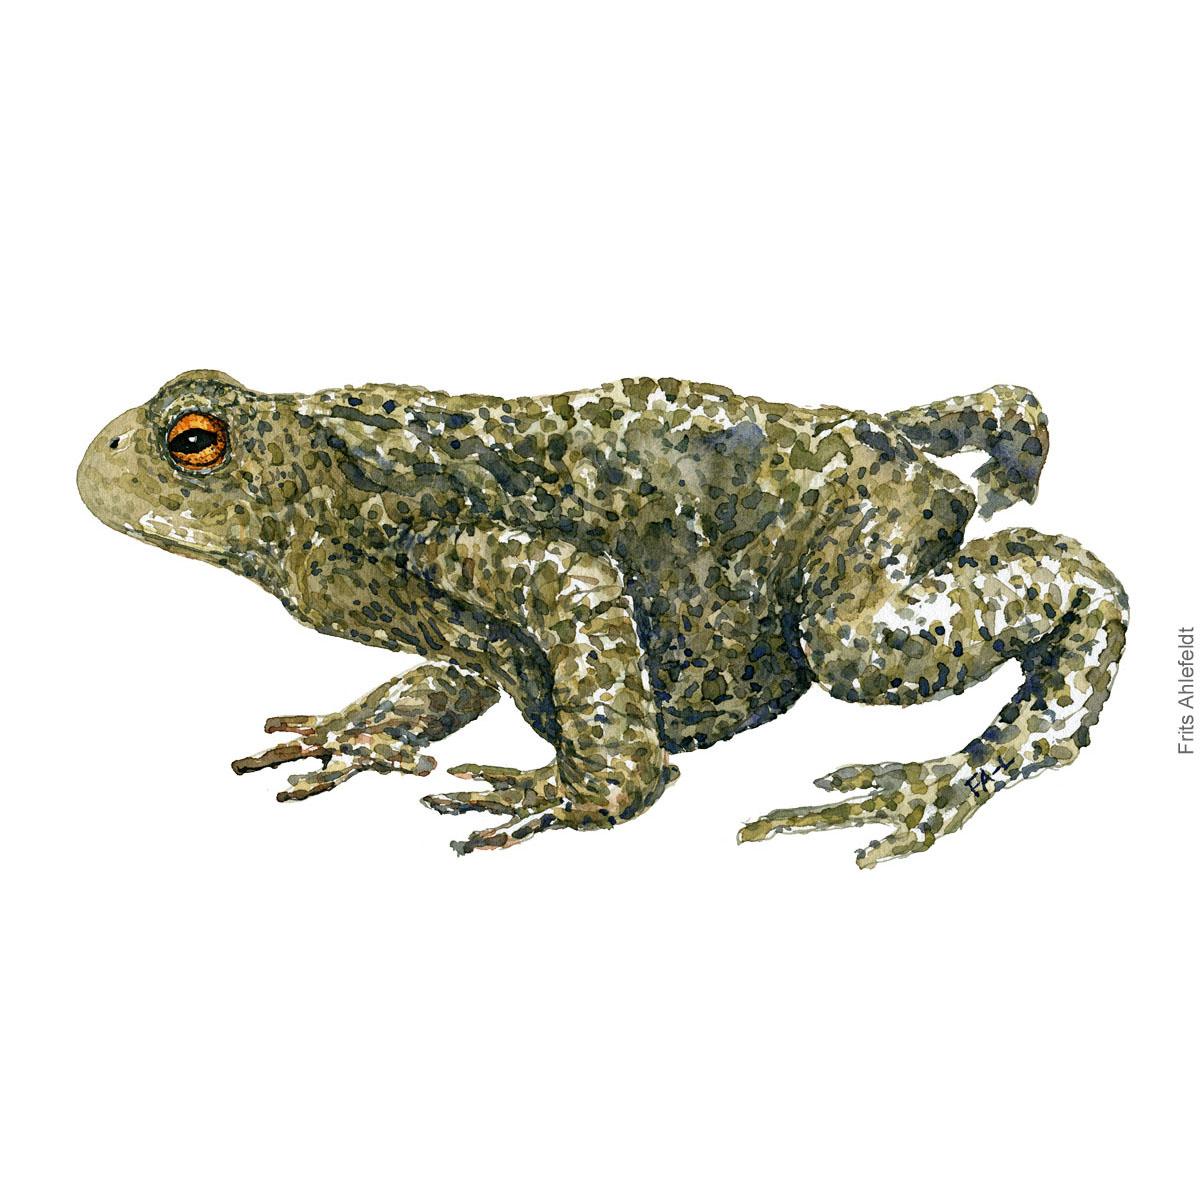 Common-toad-bufo-bufo-skrubtudse-frits-ahlefeldt watercolor - akvarel